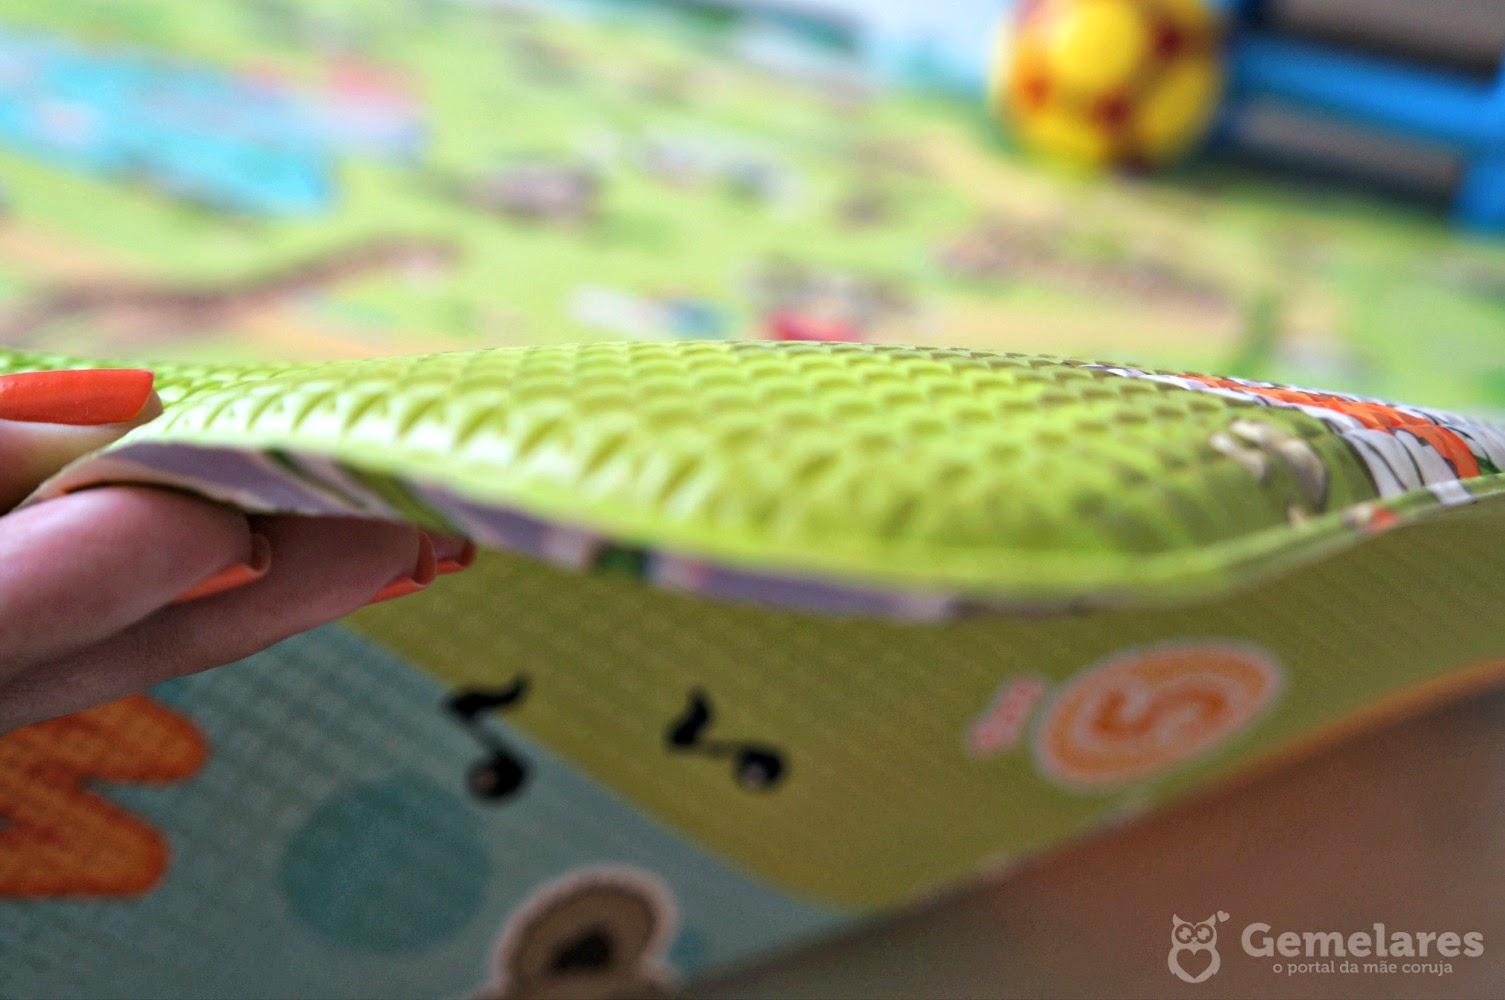 Tapete Ideal Para Beb S E Crian As Gemelares -> Tapete Para Sala Pvc